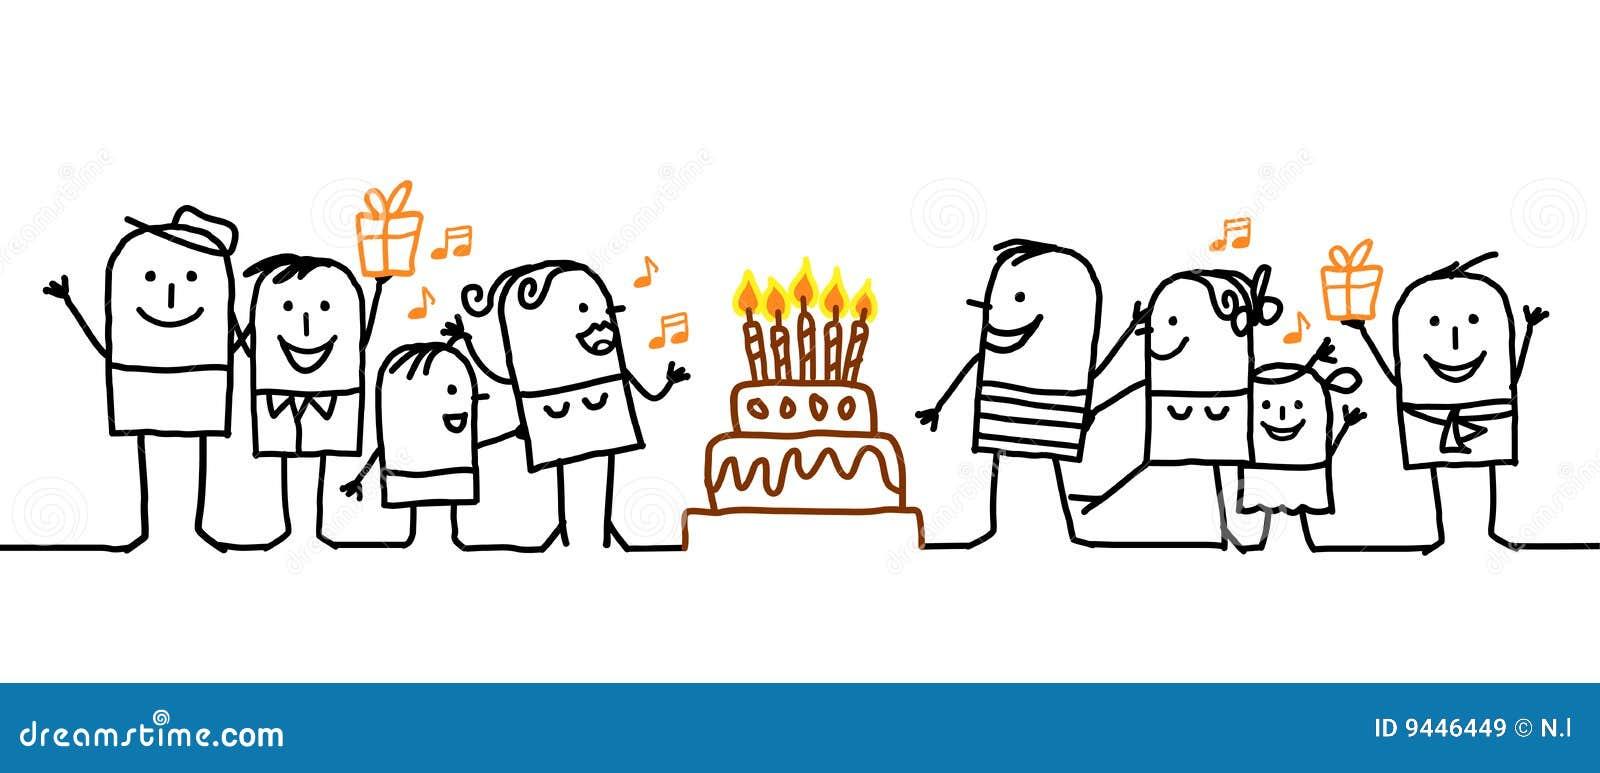 Happy Birthday ! Royalty Free Stock Images - Image: 9446449